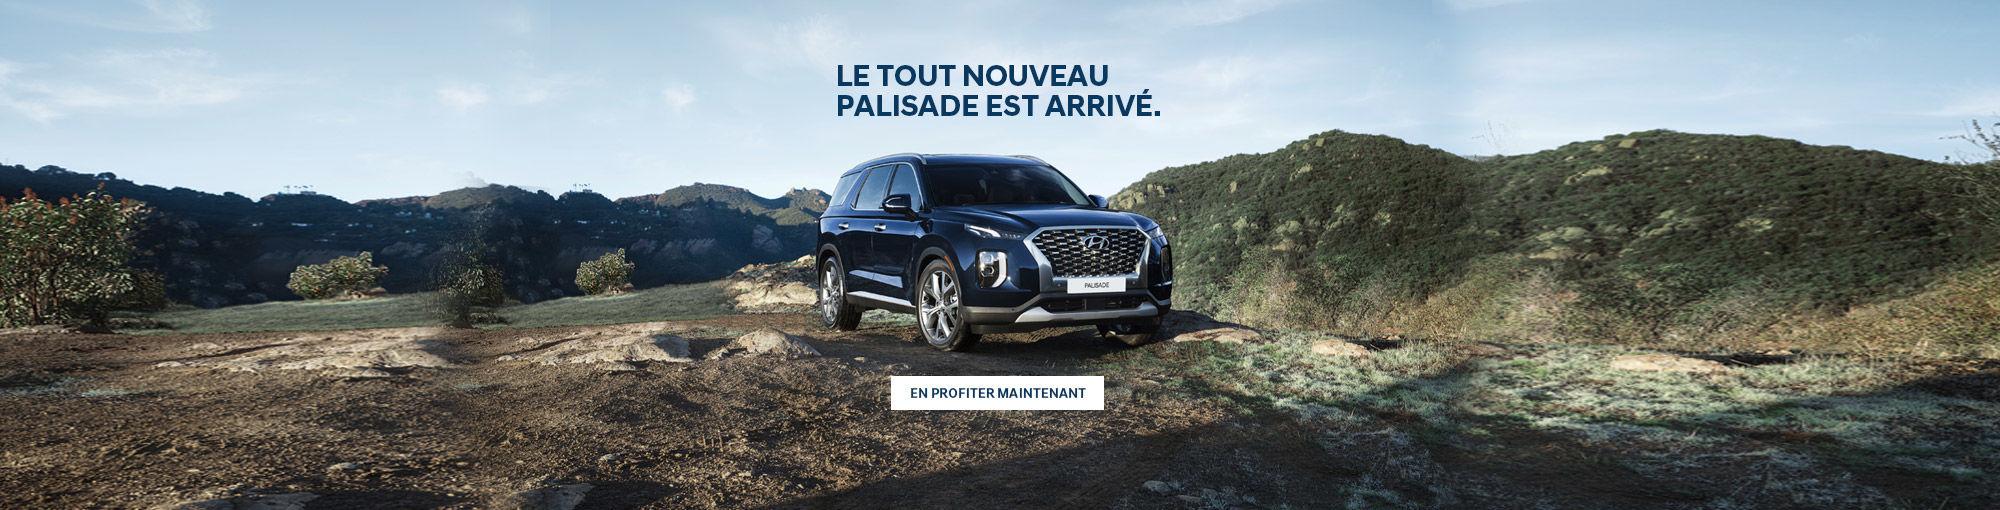 Hyundai Nouveau Palisade 2020 Main Header Juillet 2020